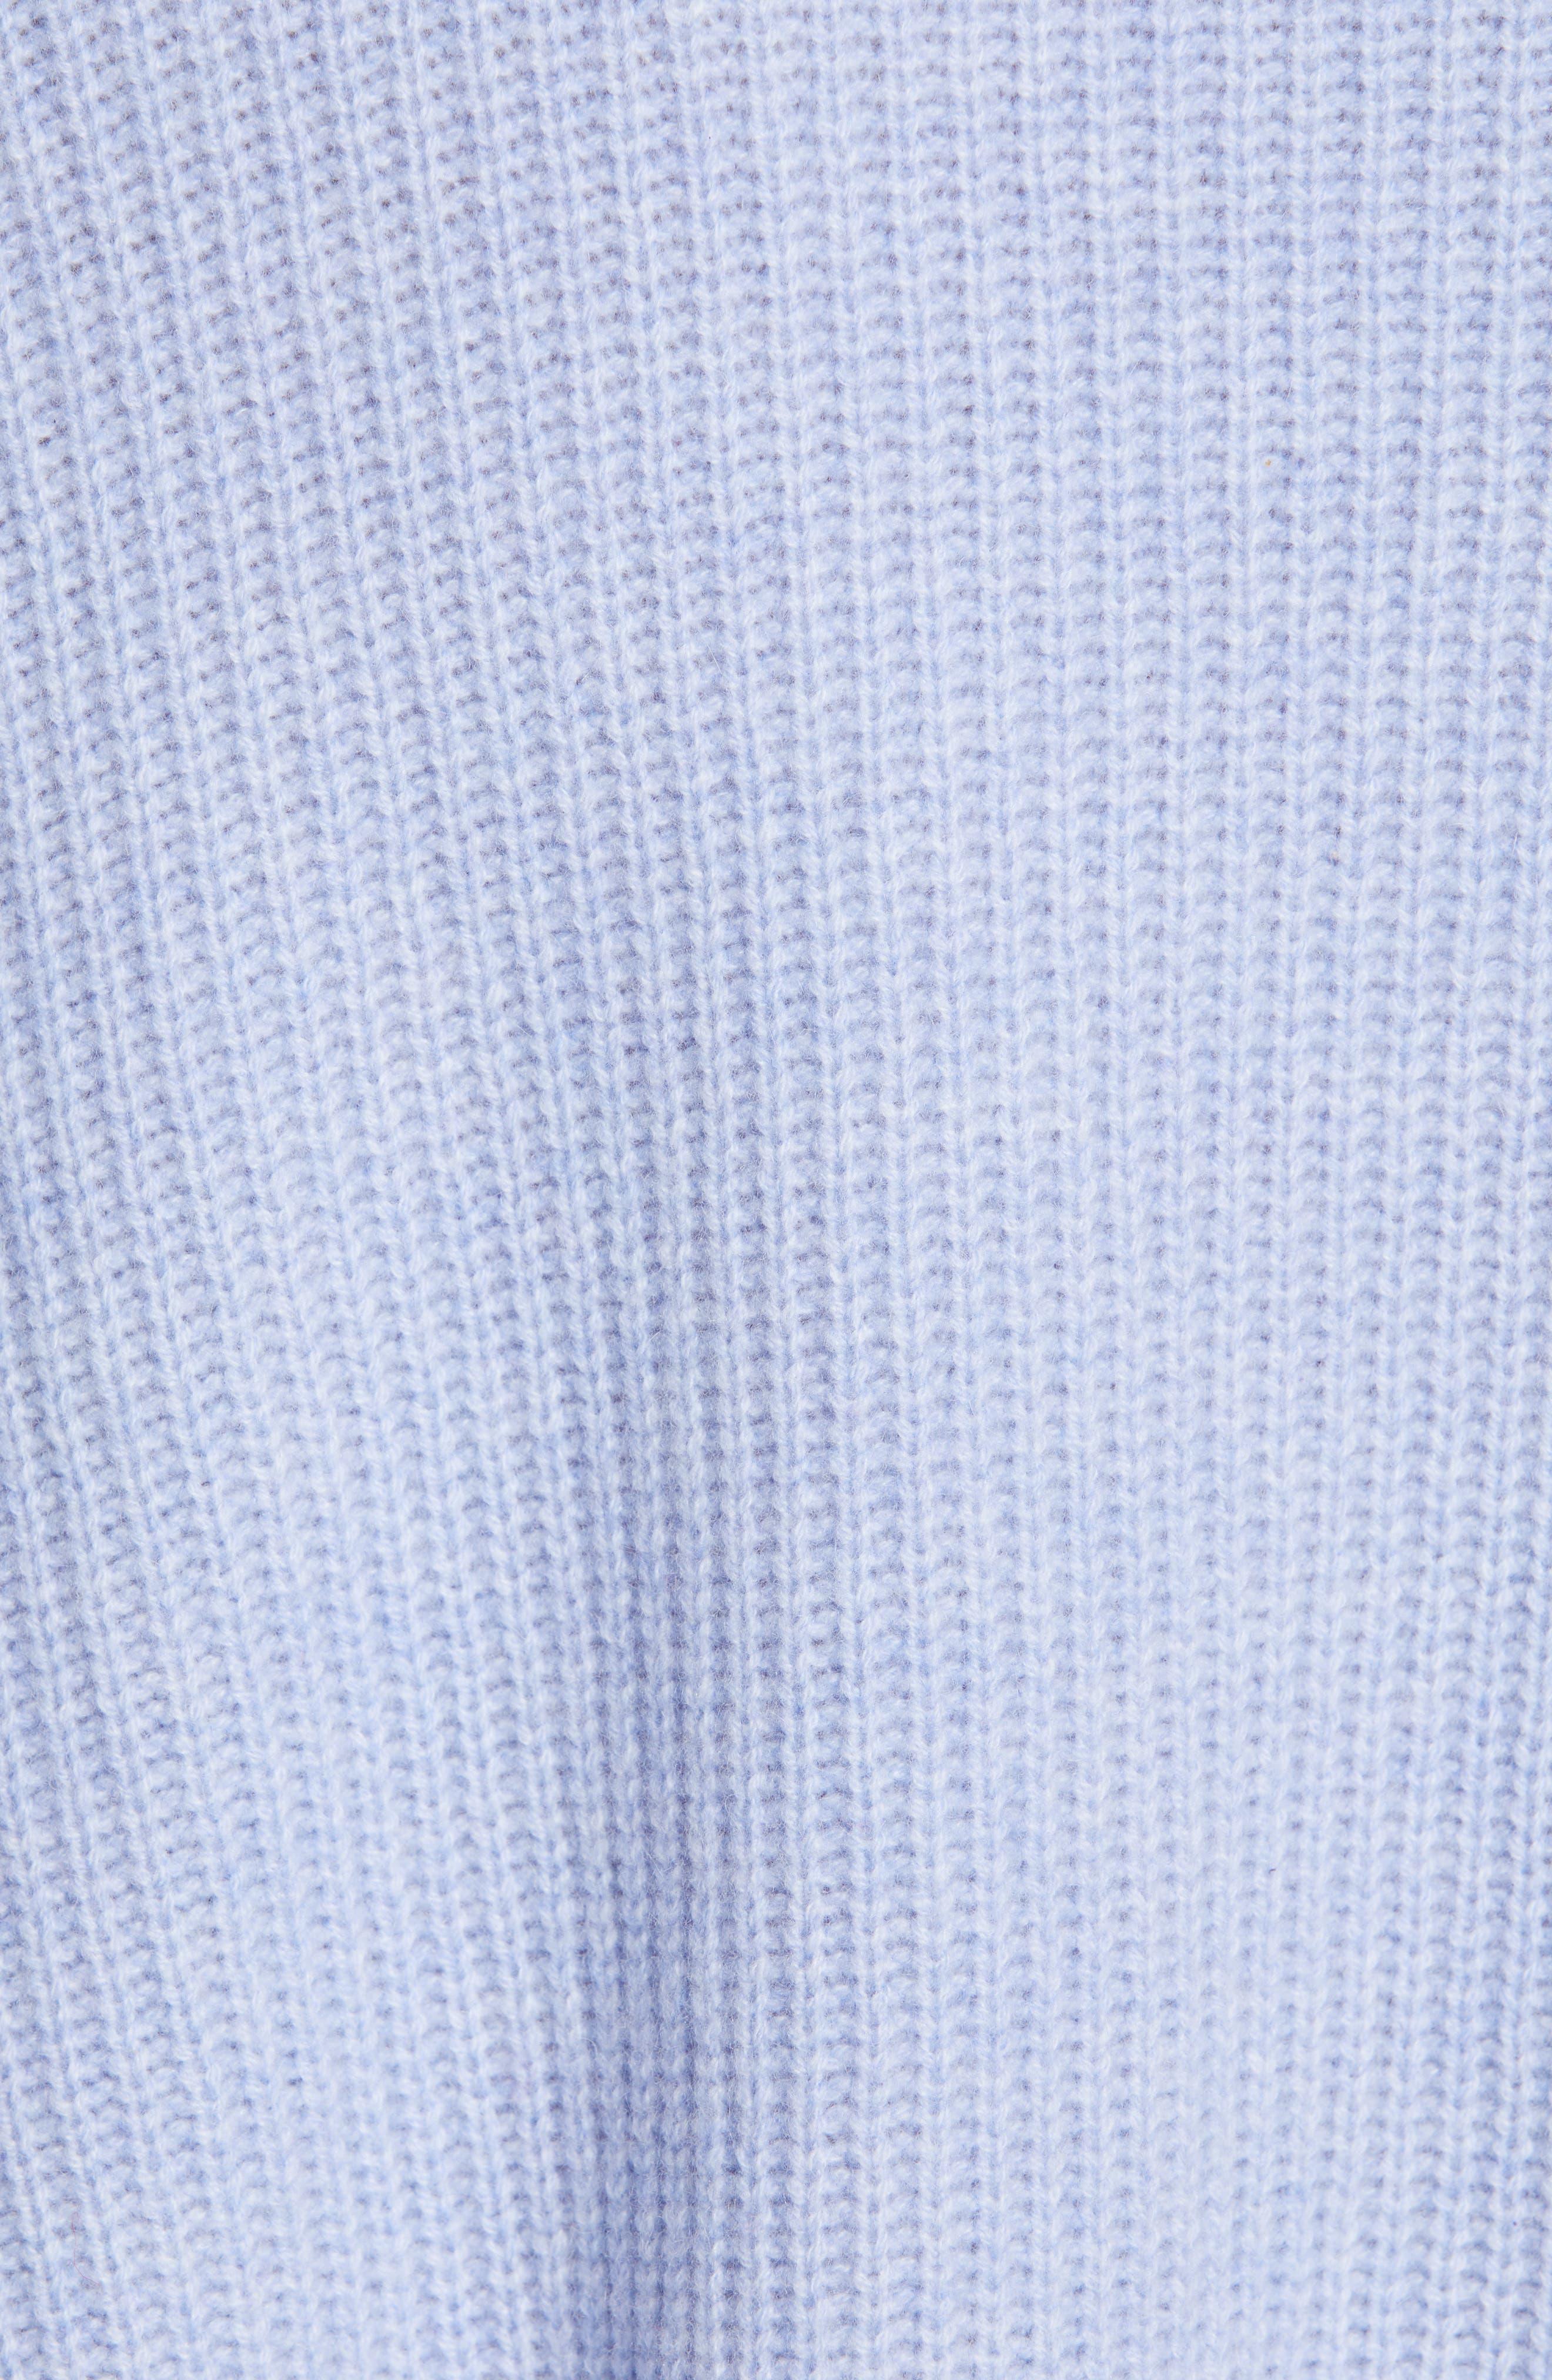 NORDSTROM SIGNATURE, Cashmere Pocket Cardigan, Alternate thumbnail 5, color, BLUE LUSTRE HEATHER